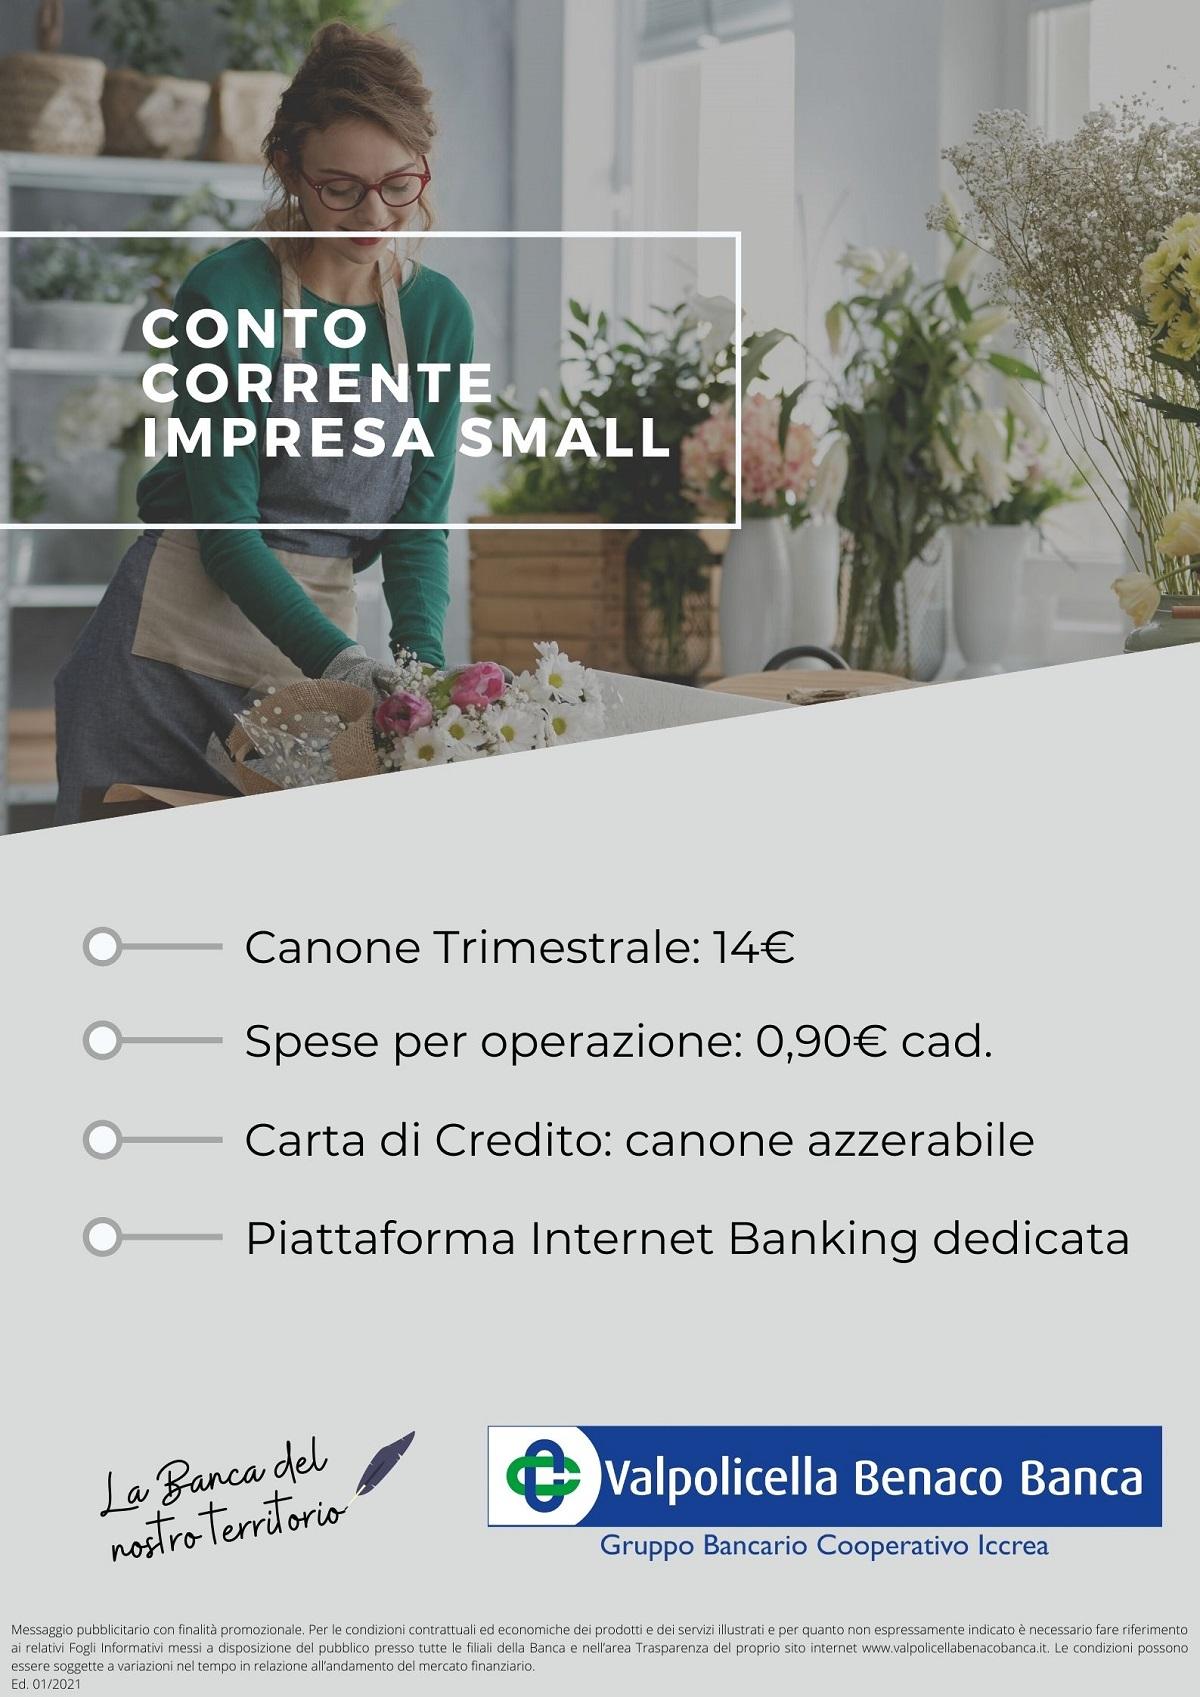 Conto Corrente Impresa Small 2021